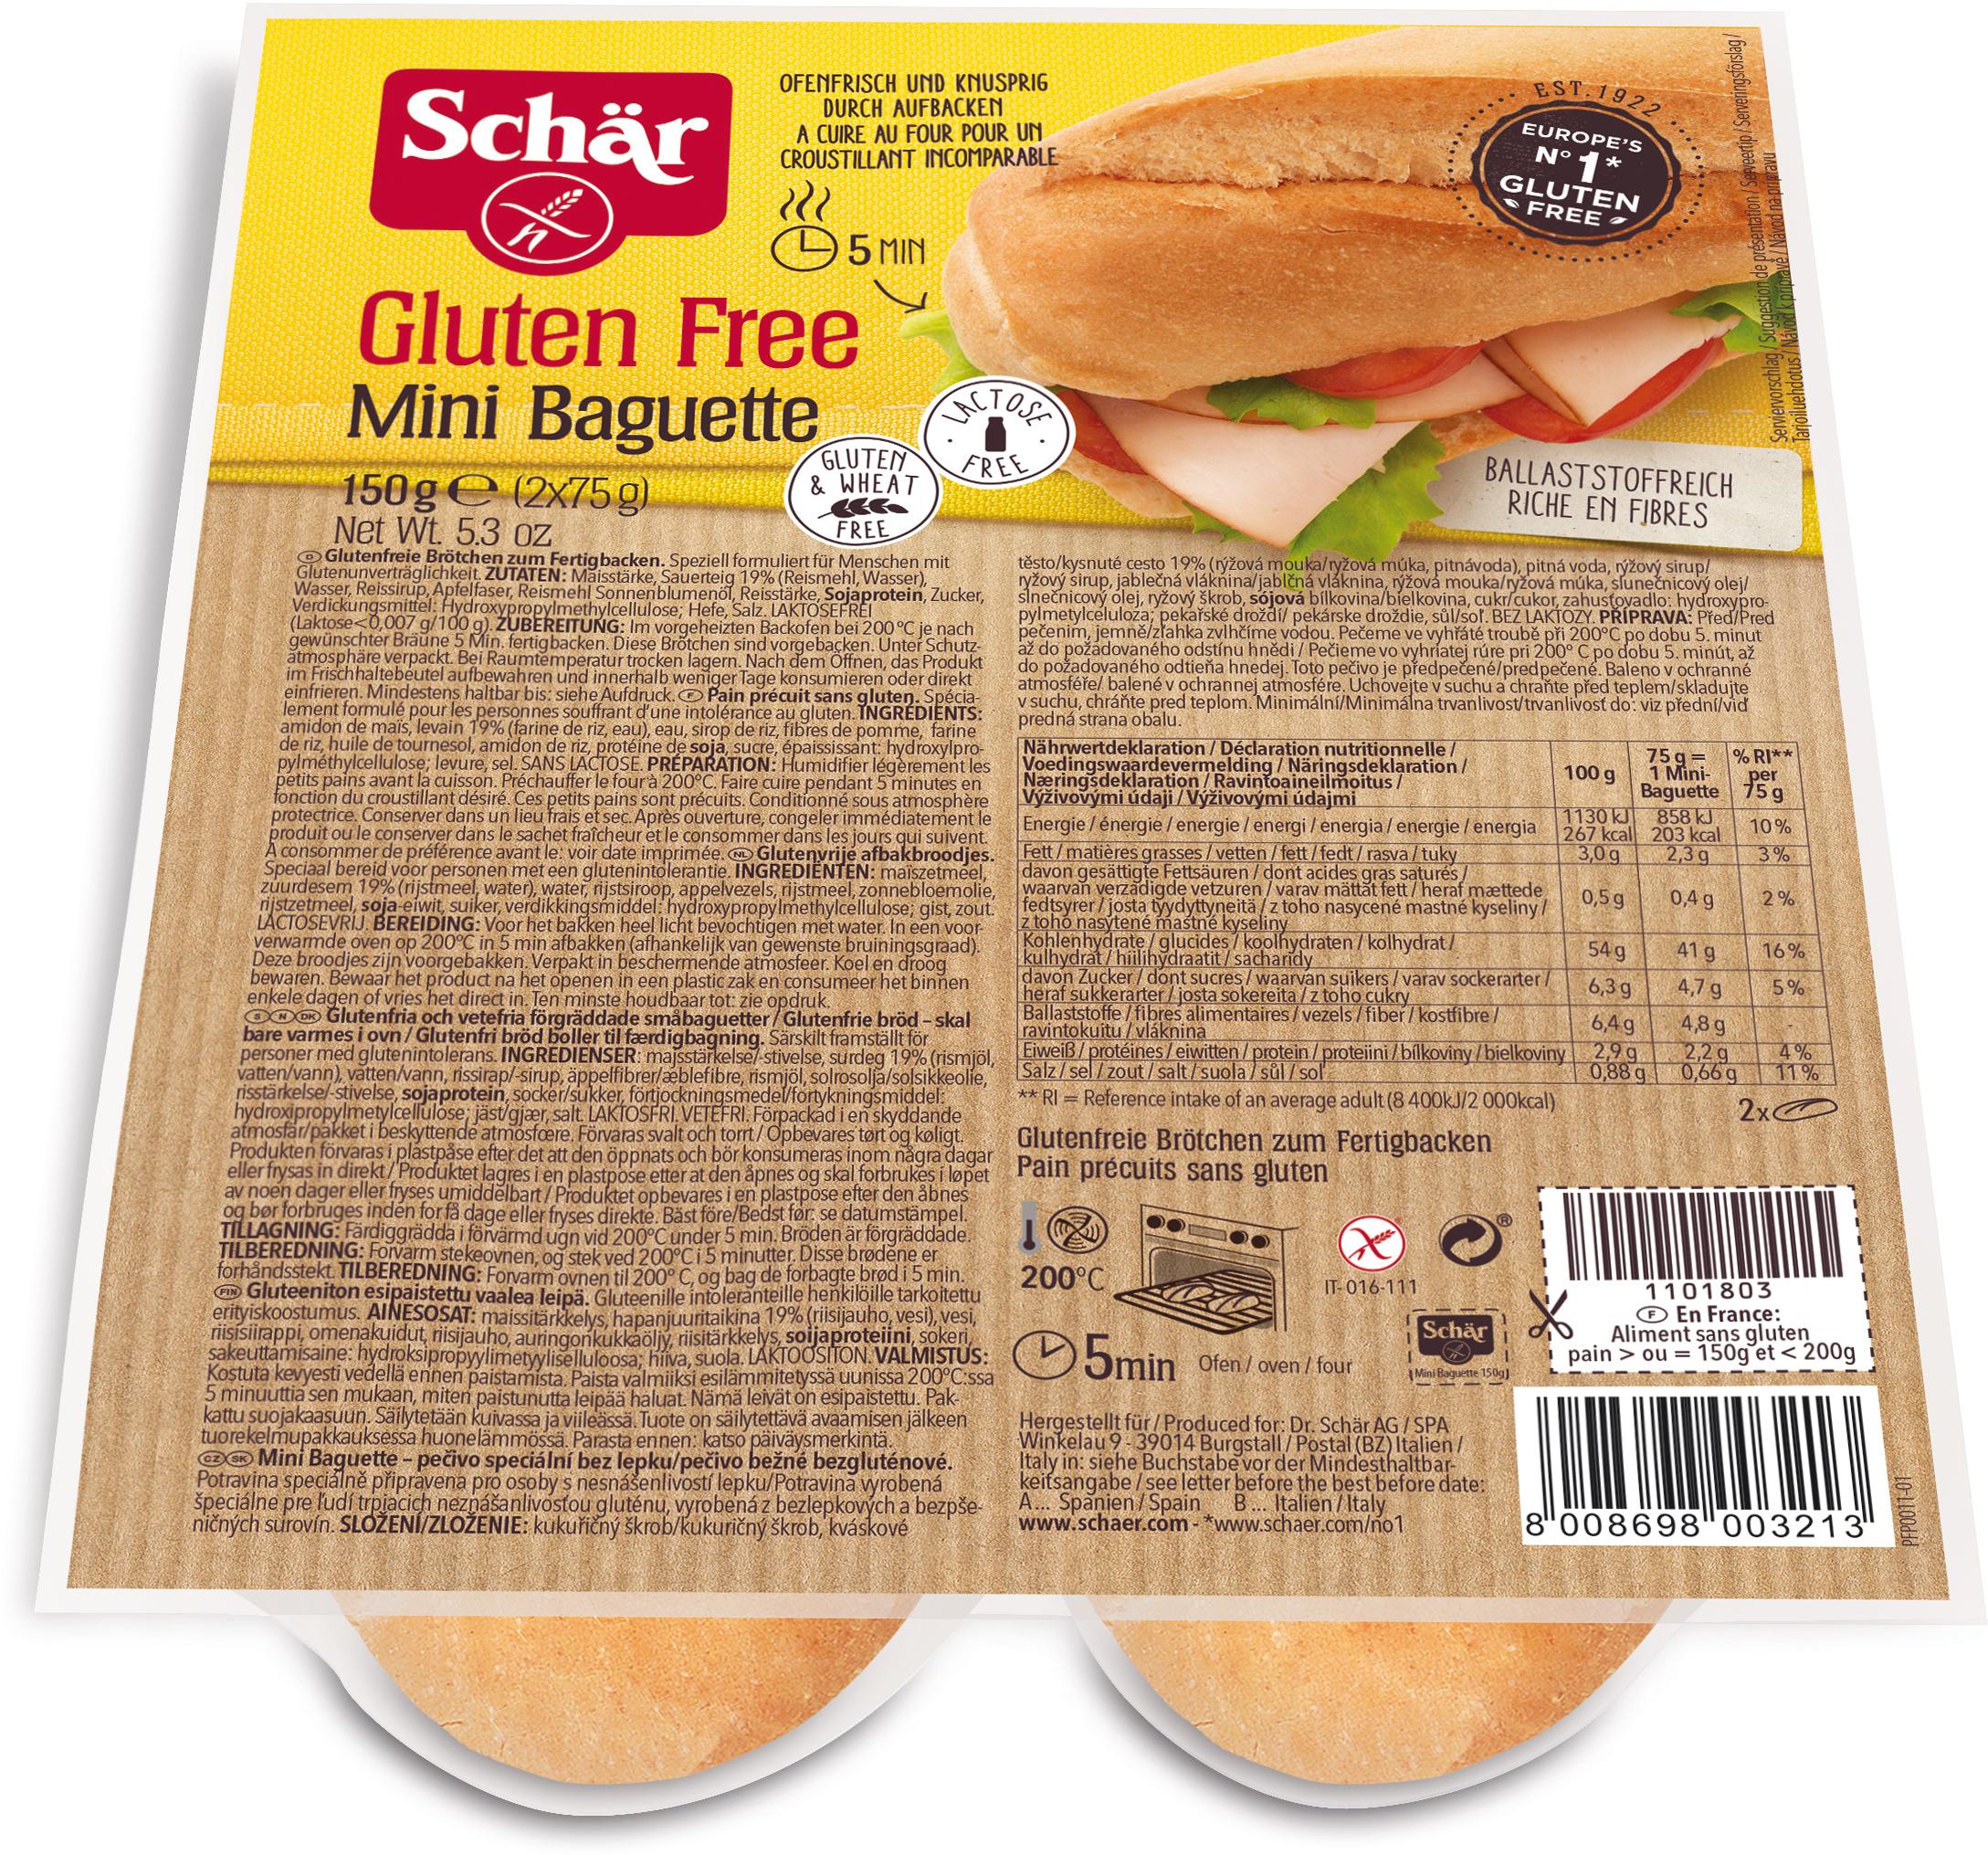 Dr. Schar Mini Baguette Duo Мини-багеты Дуо, 150 г dr schar pan cereal хлеб многозерновой 225 г